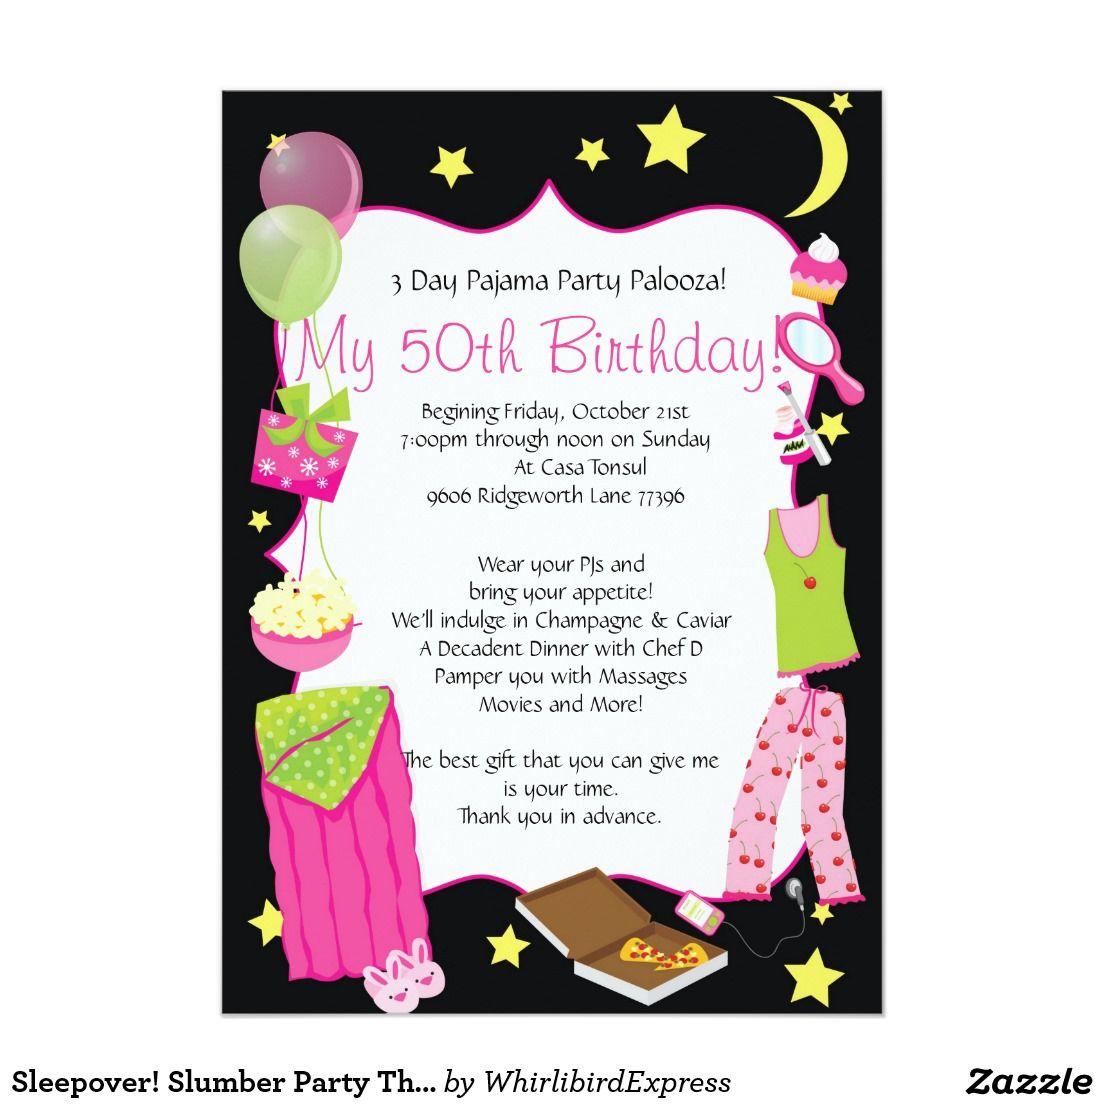 My Birthday Invite | 50th Birthday party ideas | Pinterest